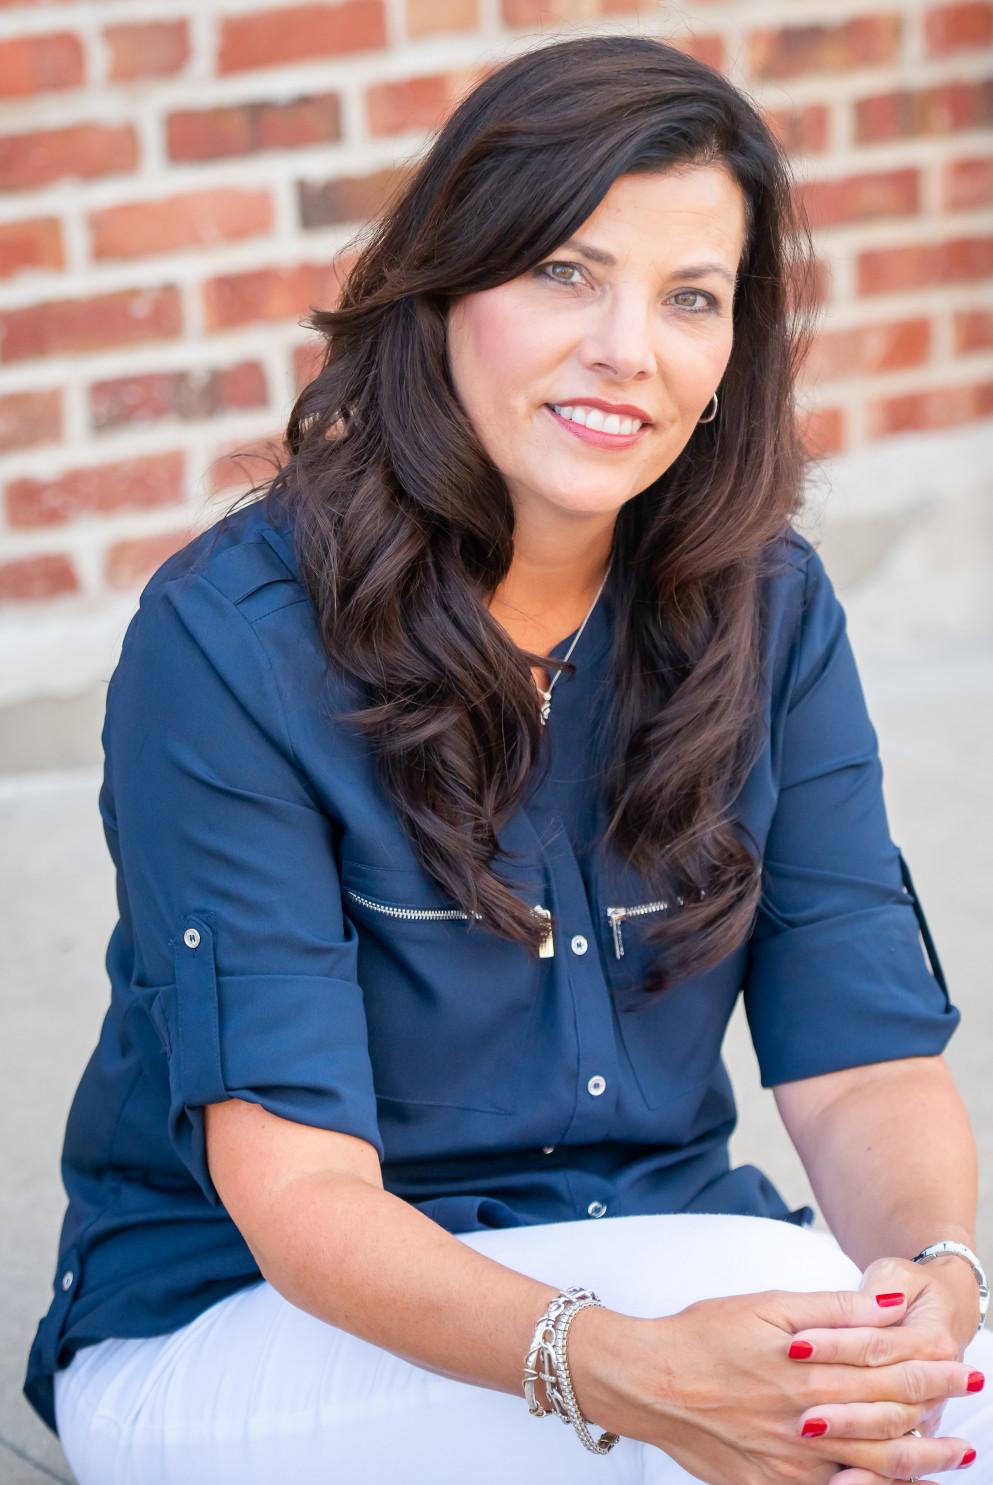 Susan Law